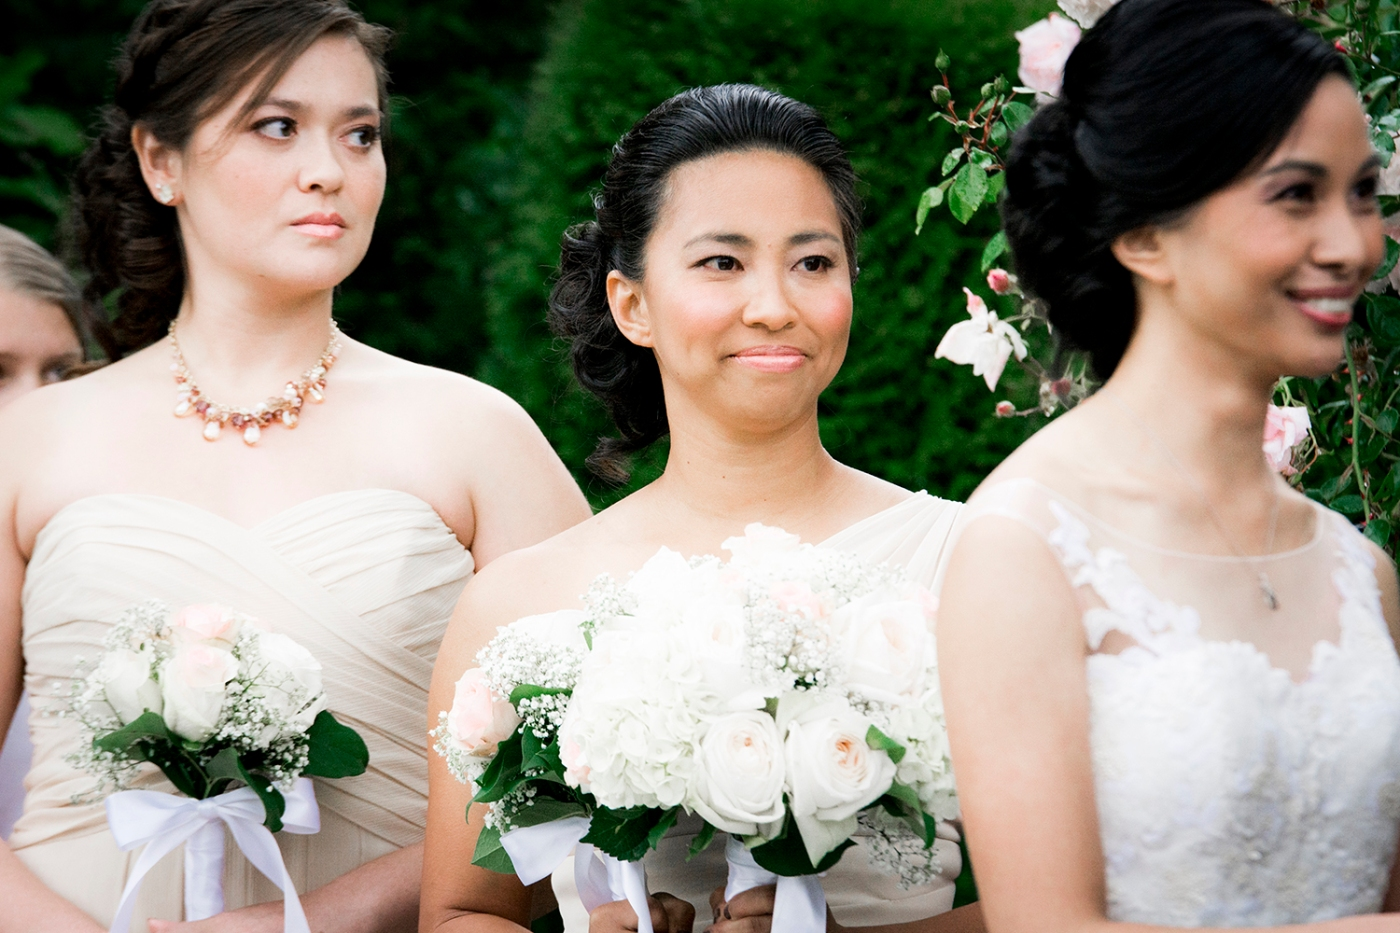 Jane_Speleers_2016_Details_Wedding_Wild_Rose_Estates_Venue_JS7_7780